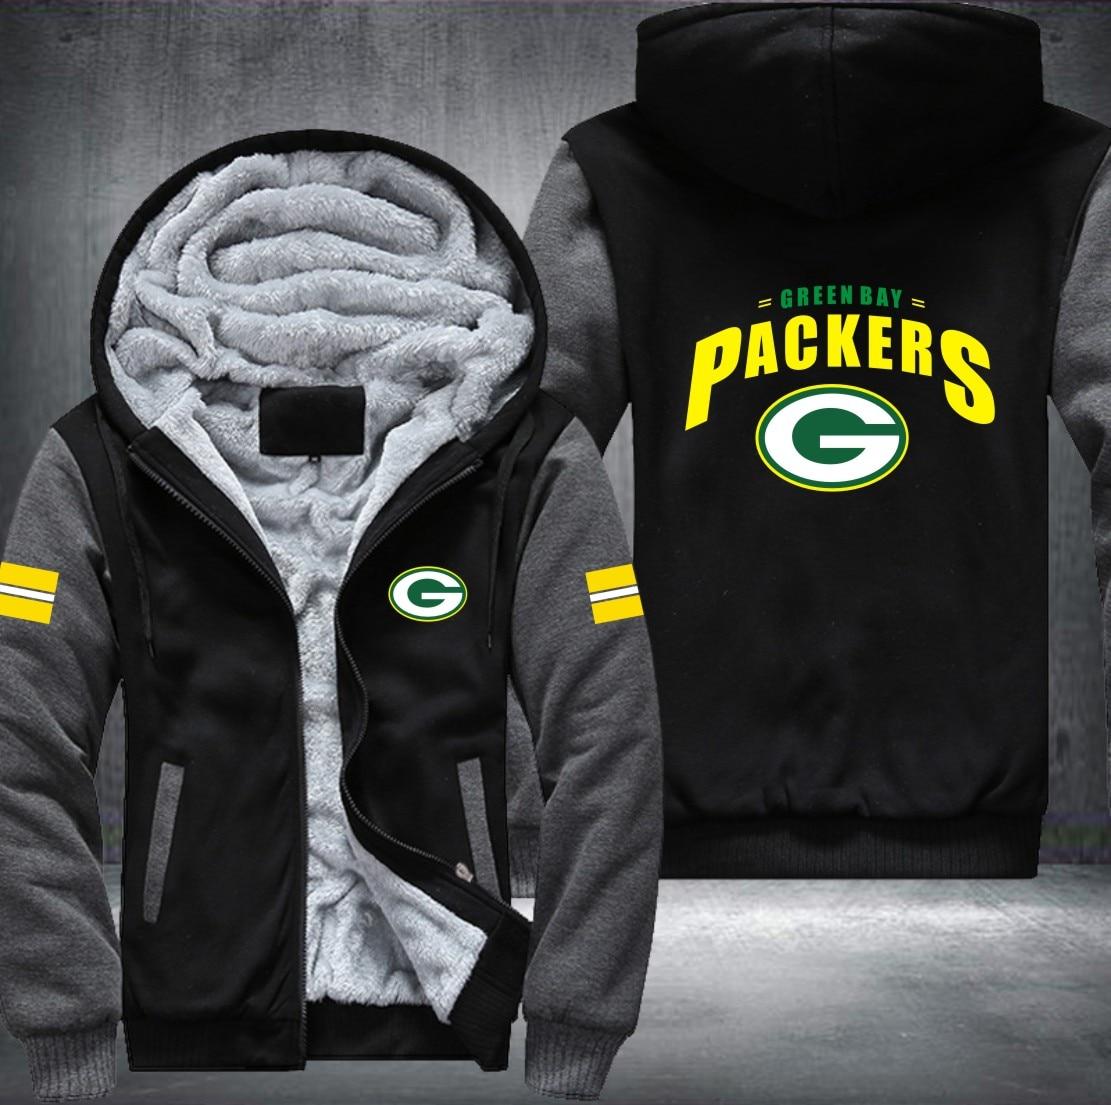 USA Plus Größe Green Bay football herren frauen Druckmuster Verdicken Fleece Zipper Hoodies Sweatshirts Mantel Jacke